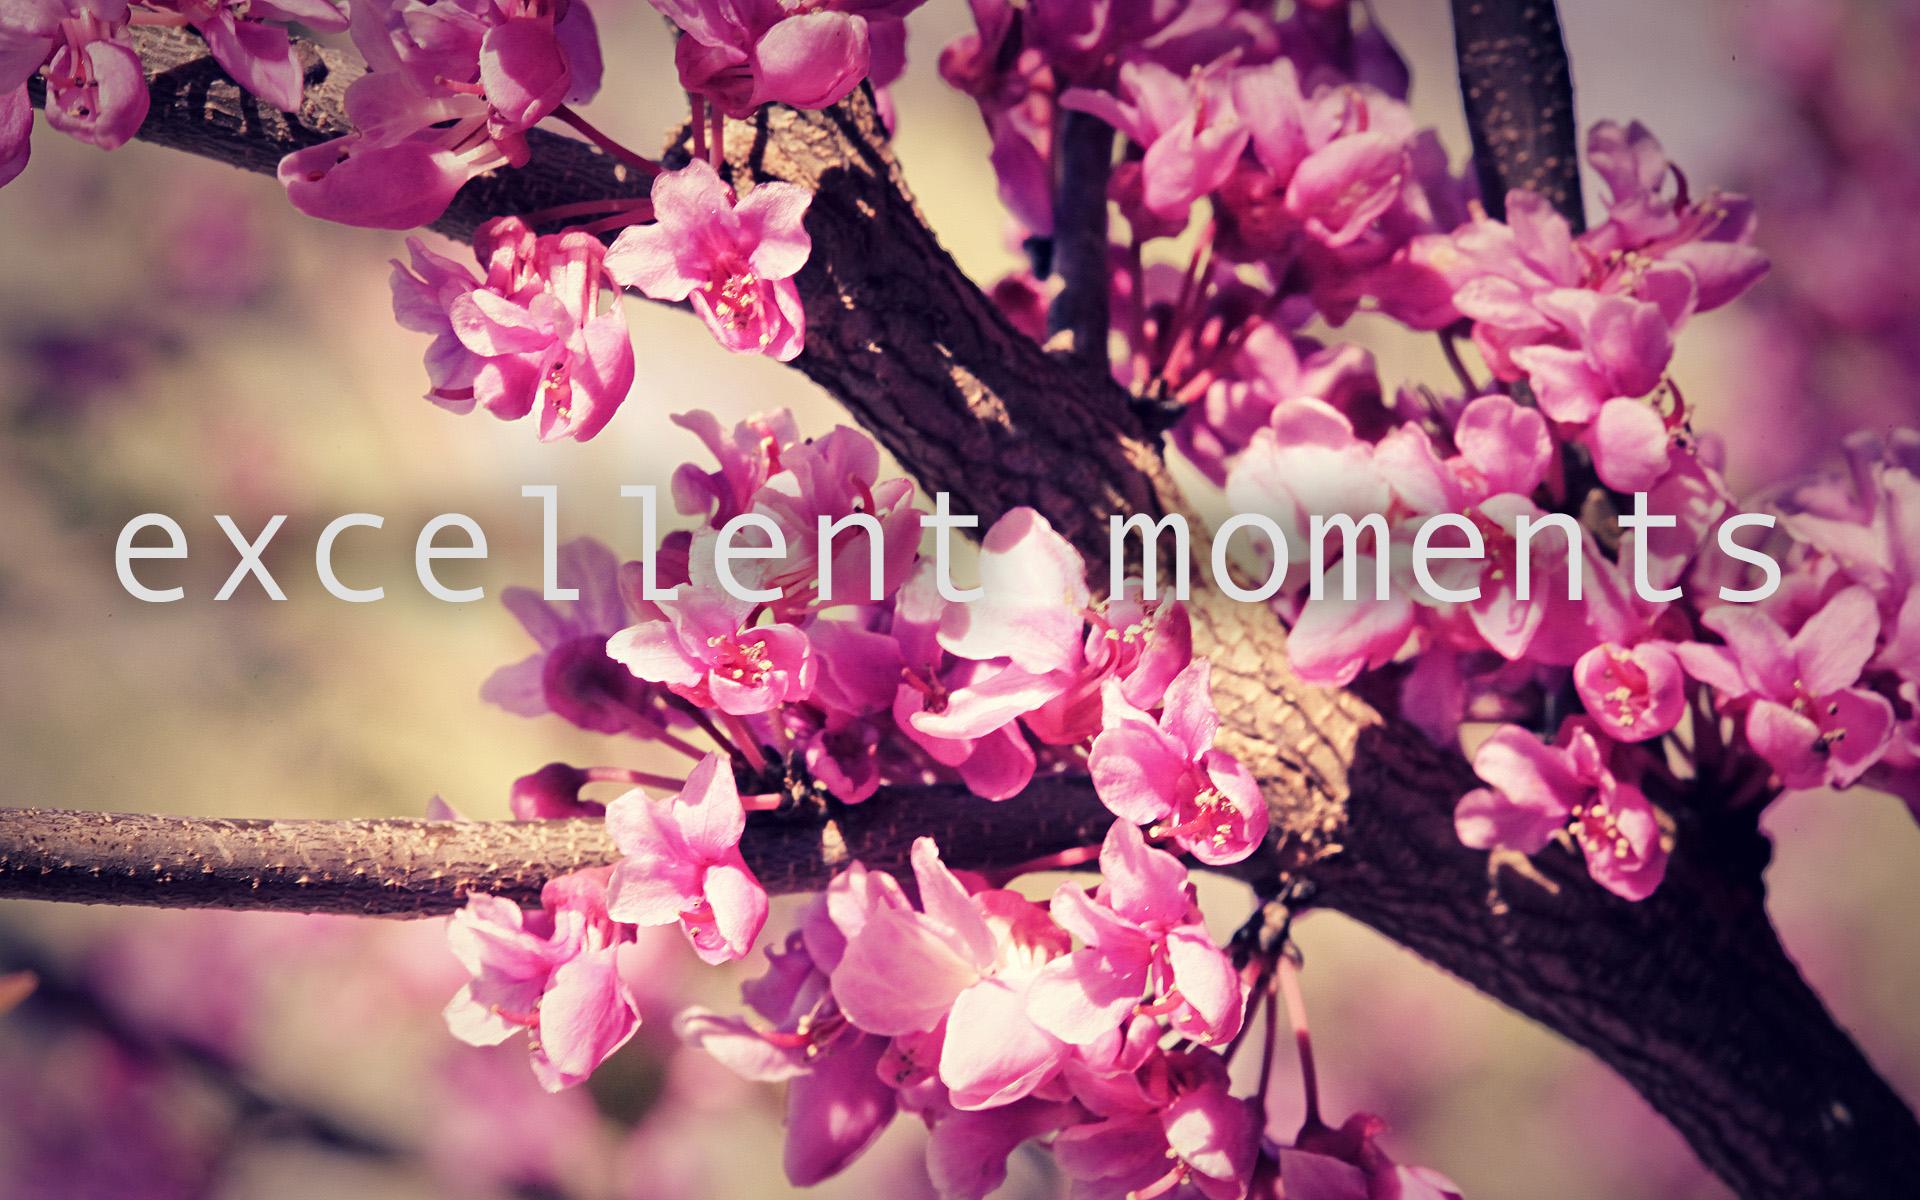 excellent moments